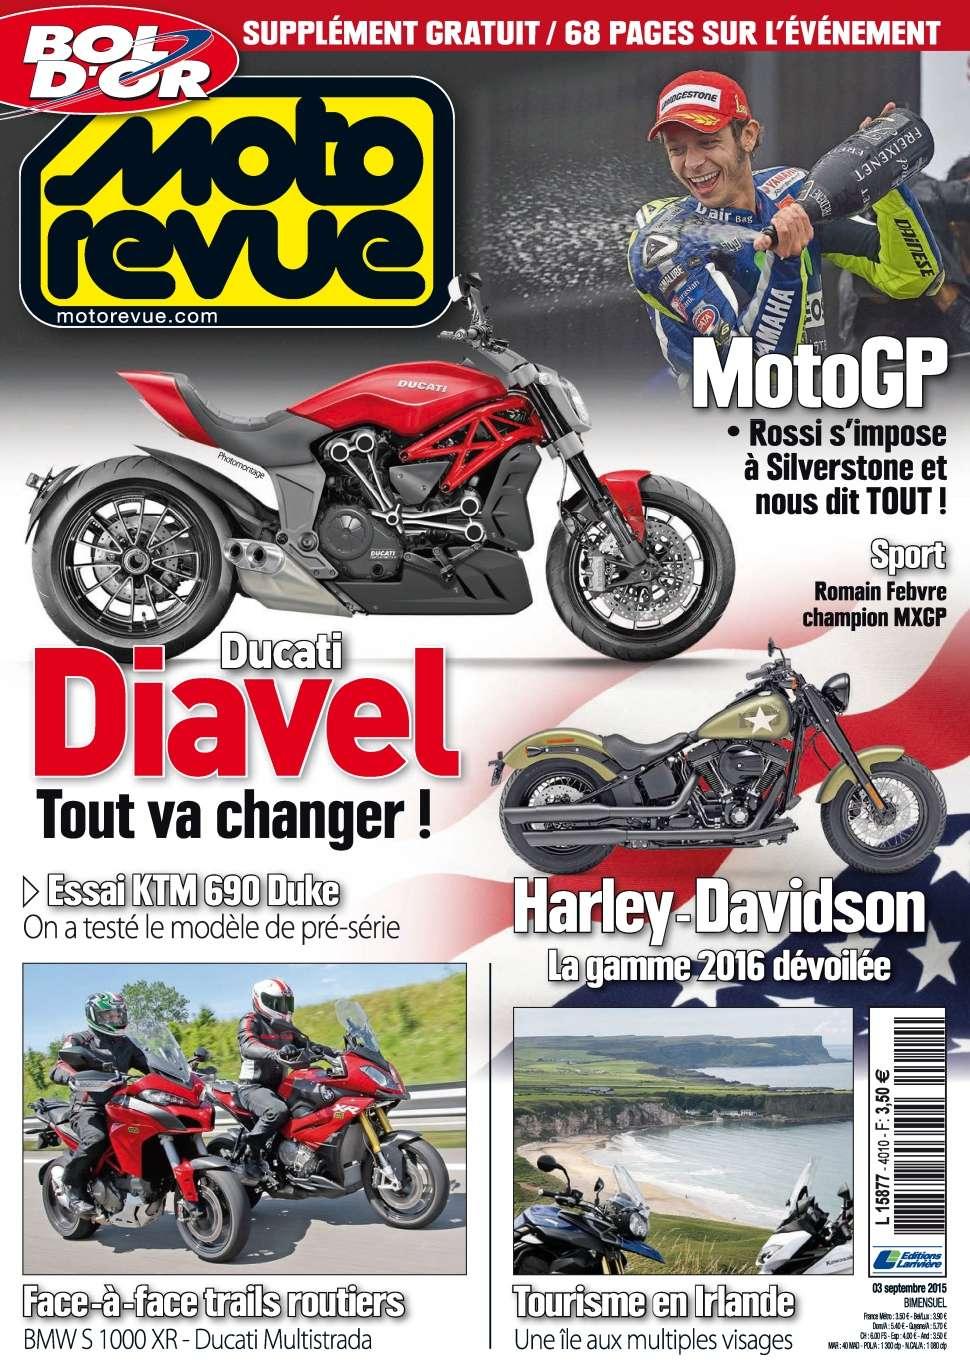 Moto Revue 4010 - 3 Septembre 2015